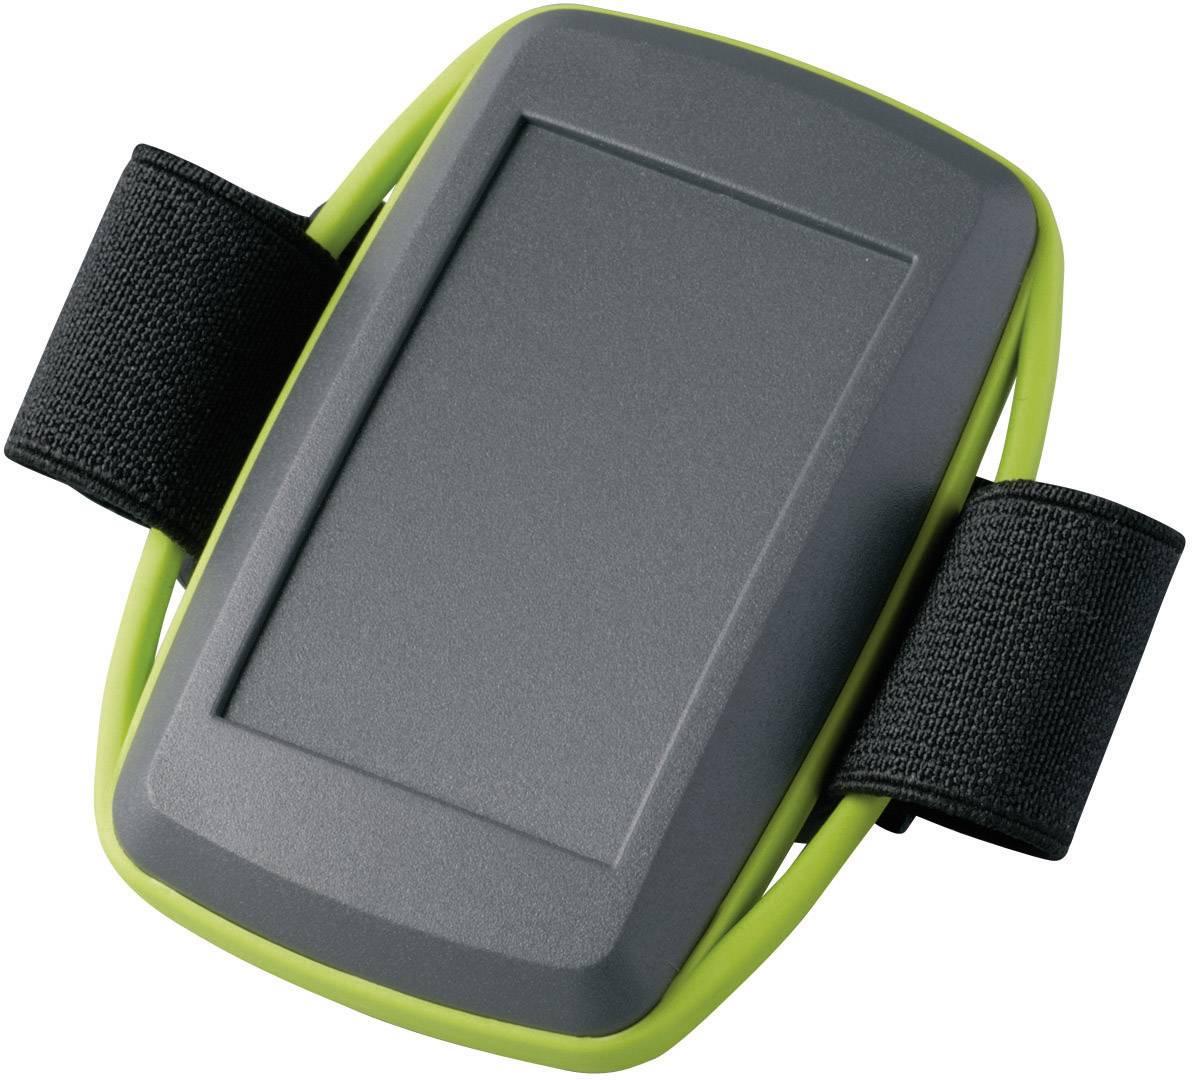 Plastová krabička OKW MINITEC D9106178, 78 x 48 x 20 mm, umelá hmota, IP40, lávová, zelená, 1 sada